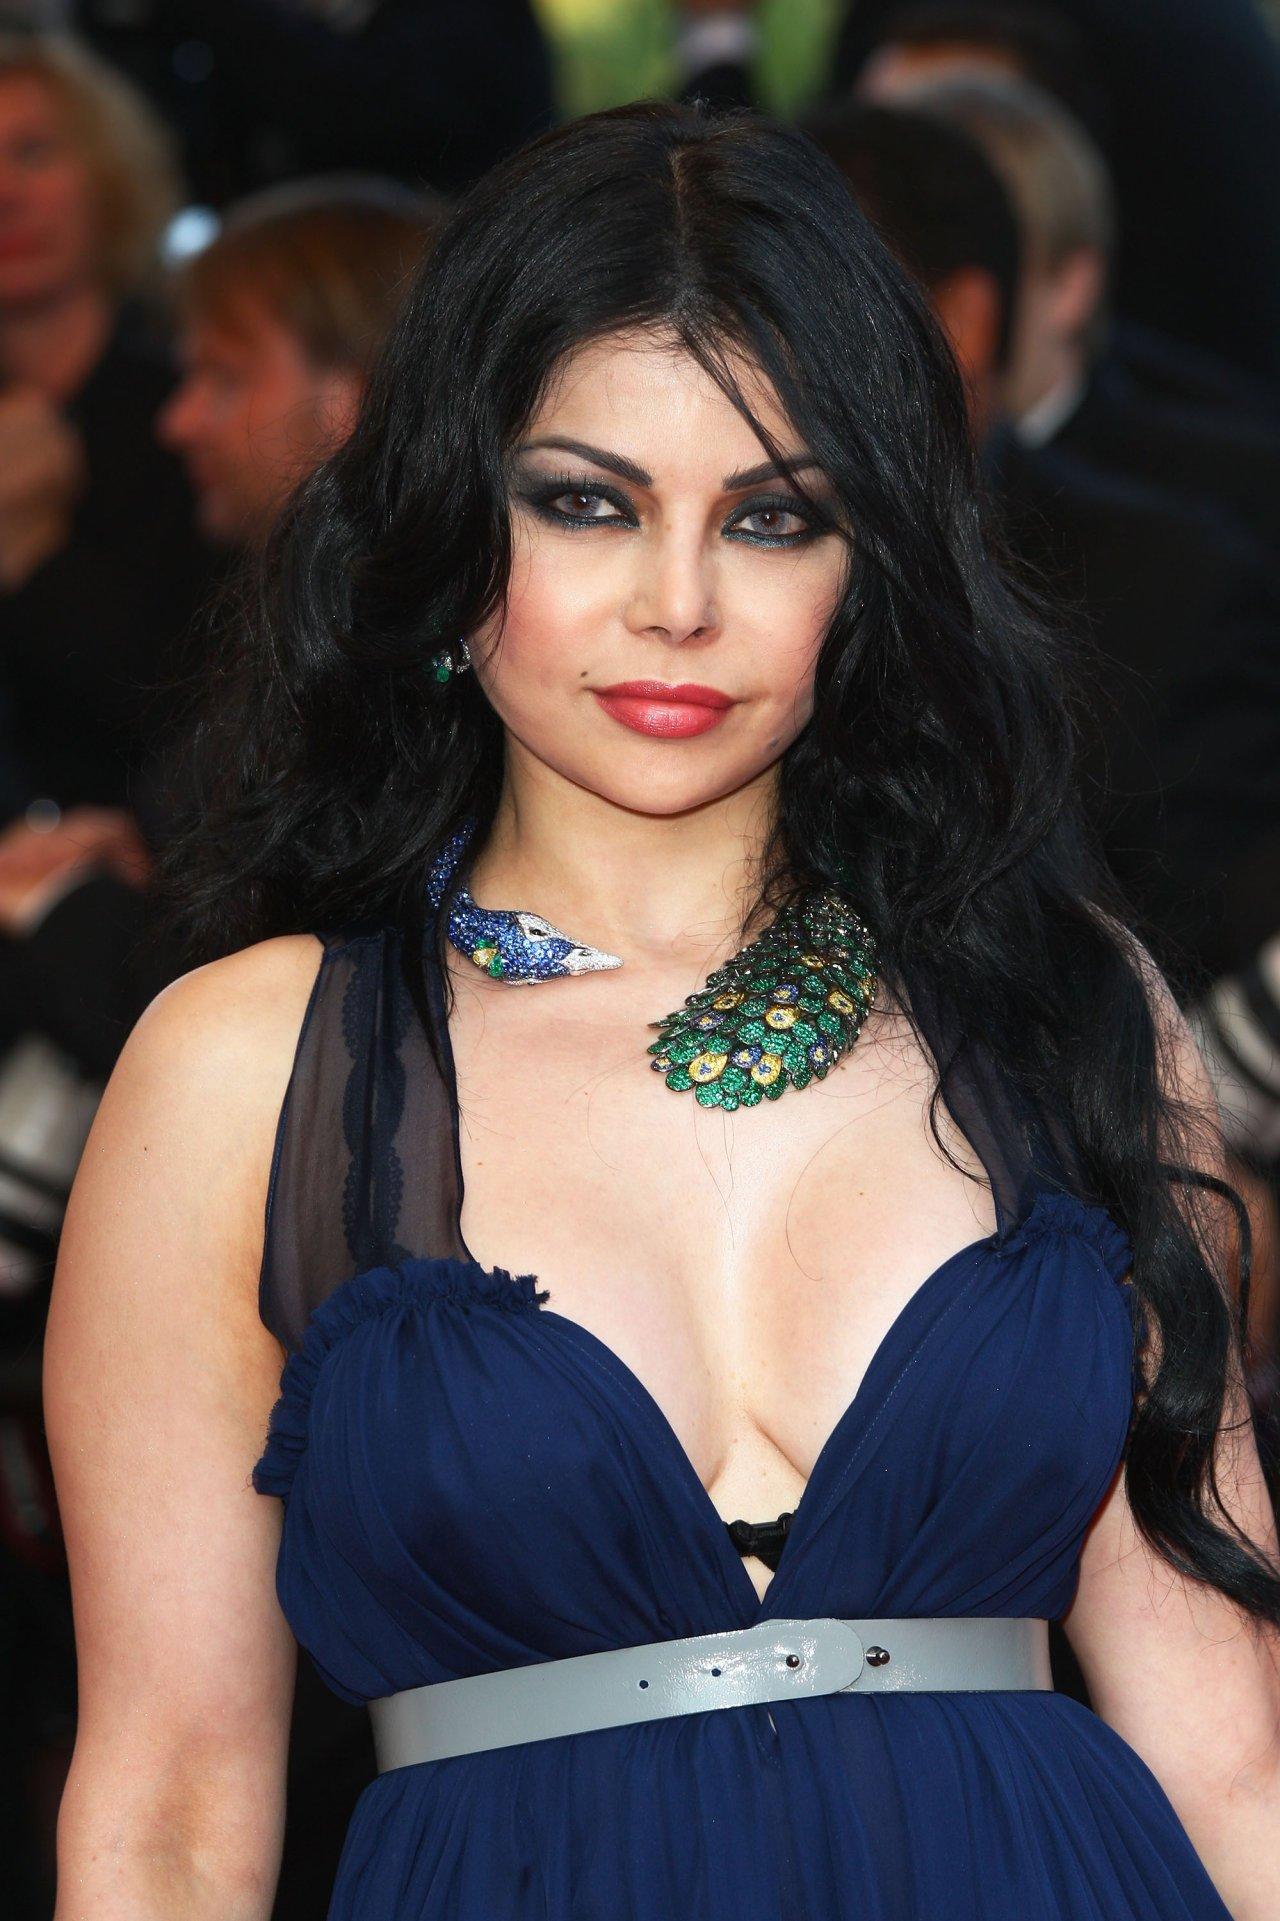 Celebrity photo haifa wehbe haifa wehbe photo 411544 2 vote